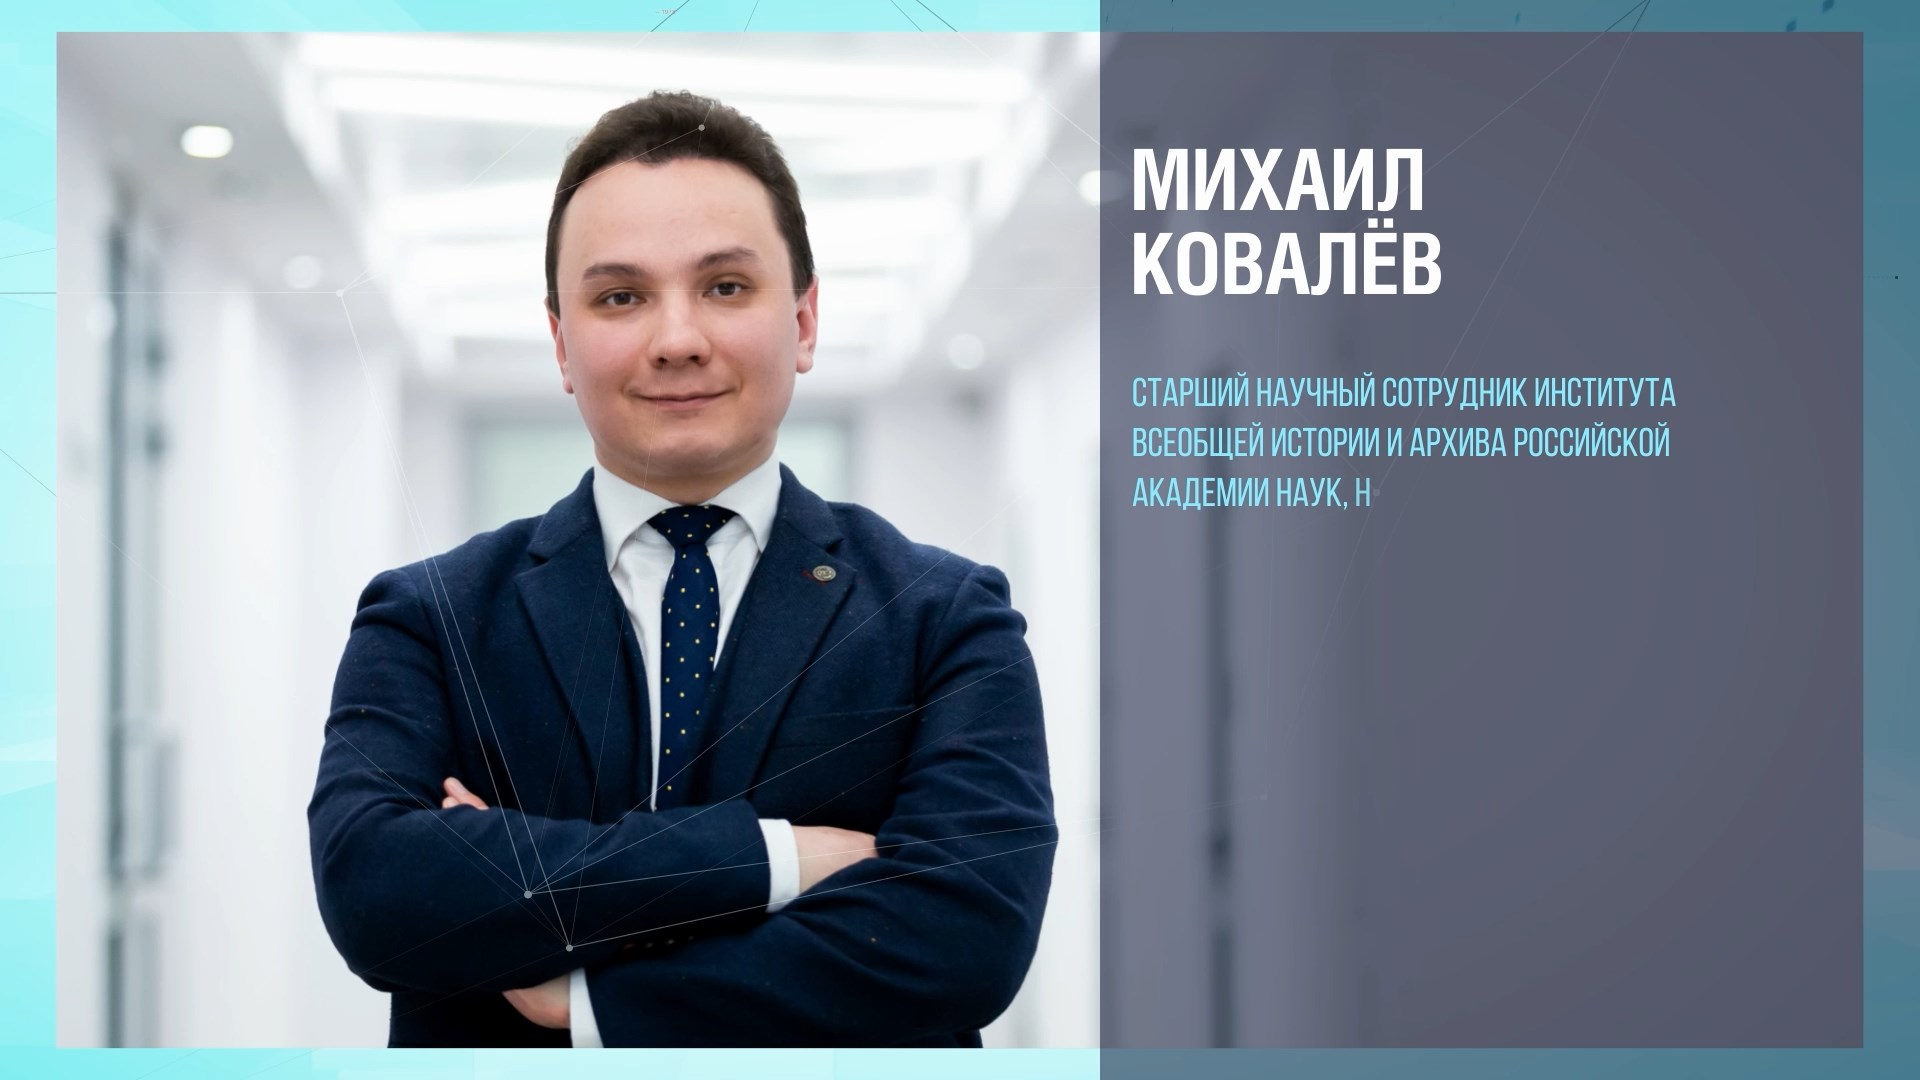 Михаил Ковалёв